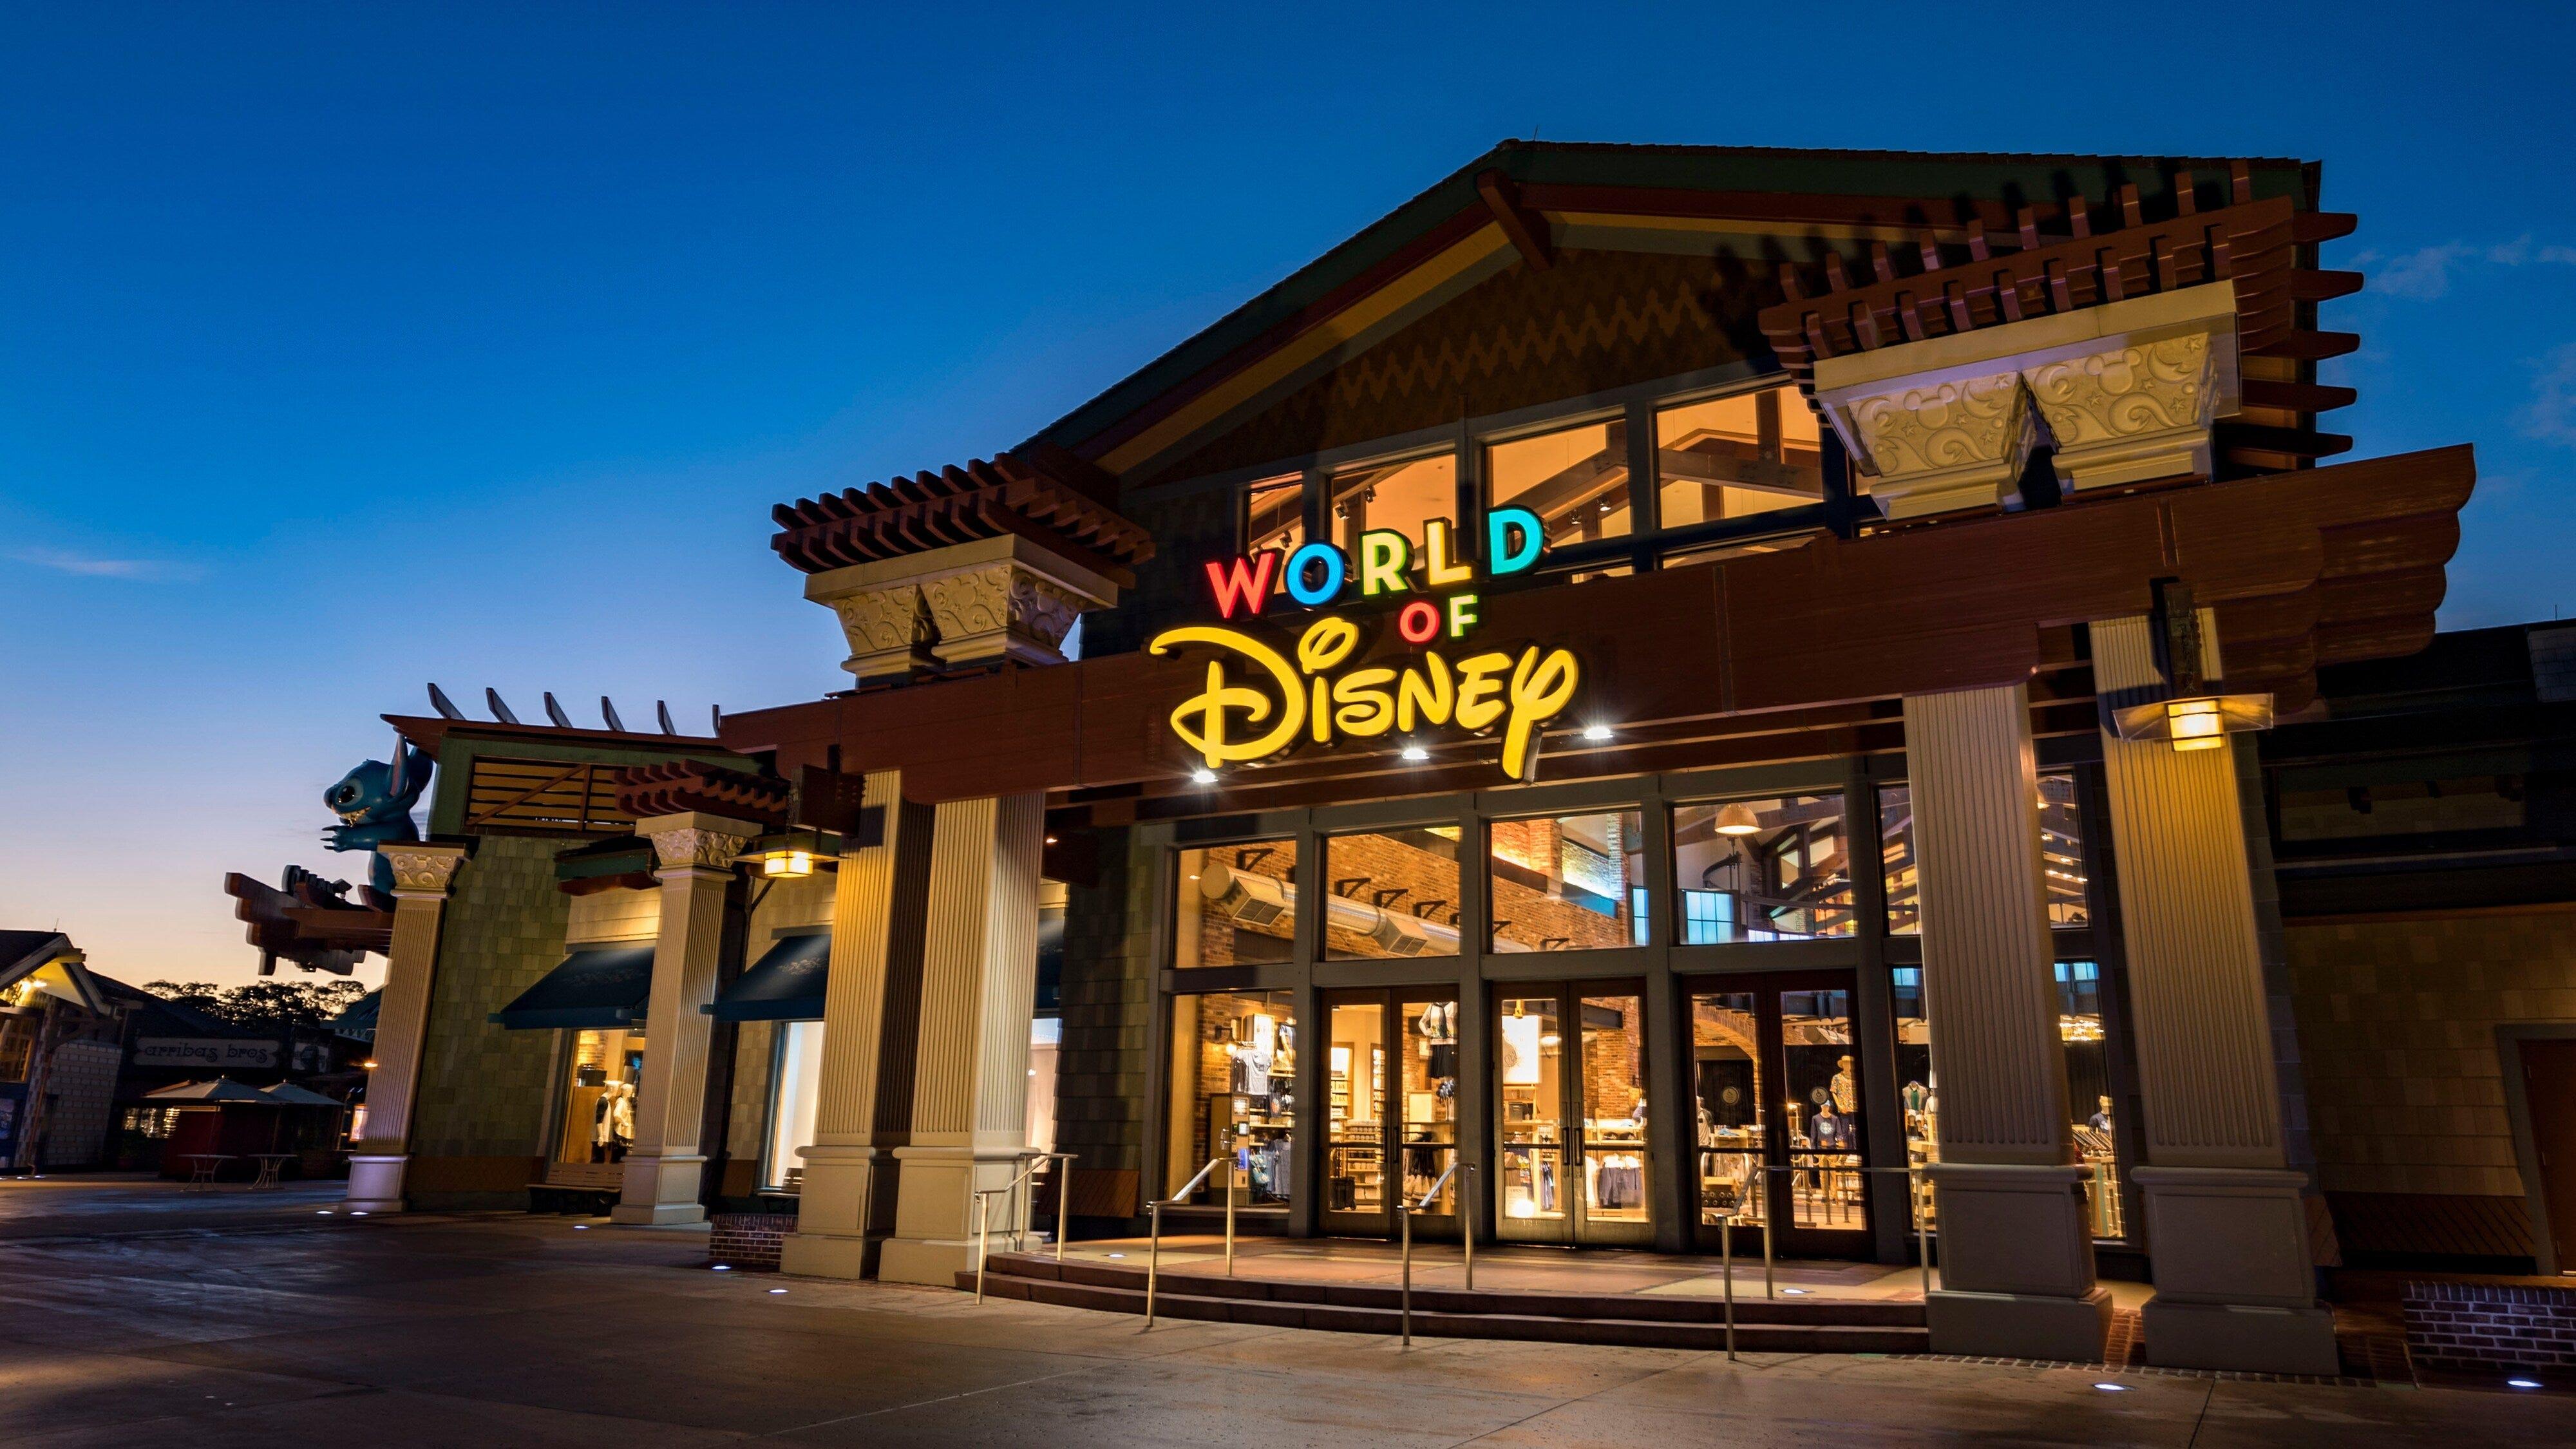 World of Disney store at Disney Springs in Orlando, Florida.